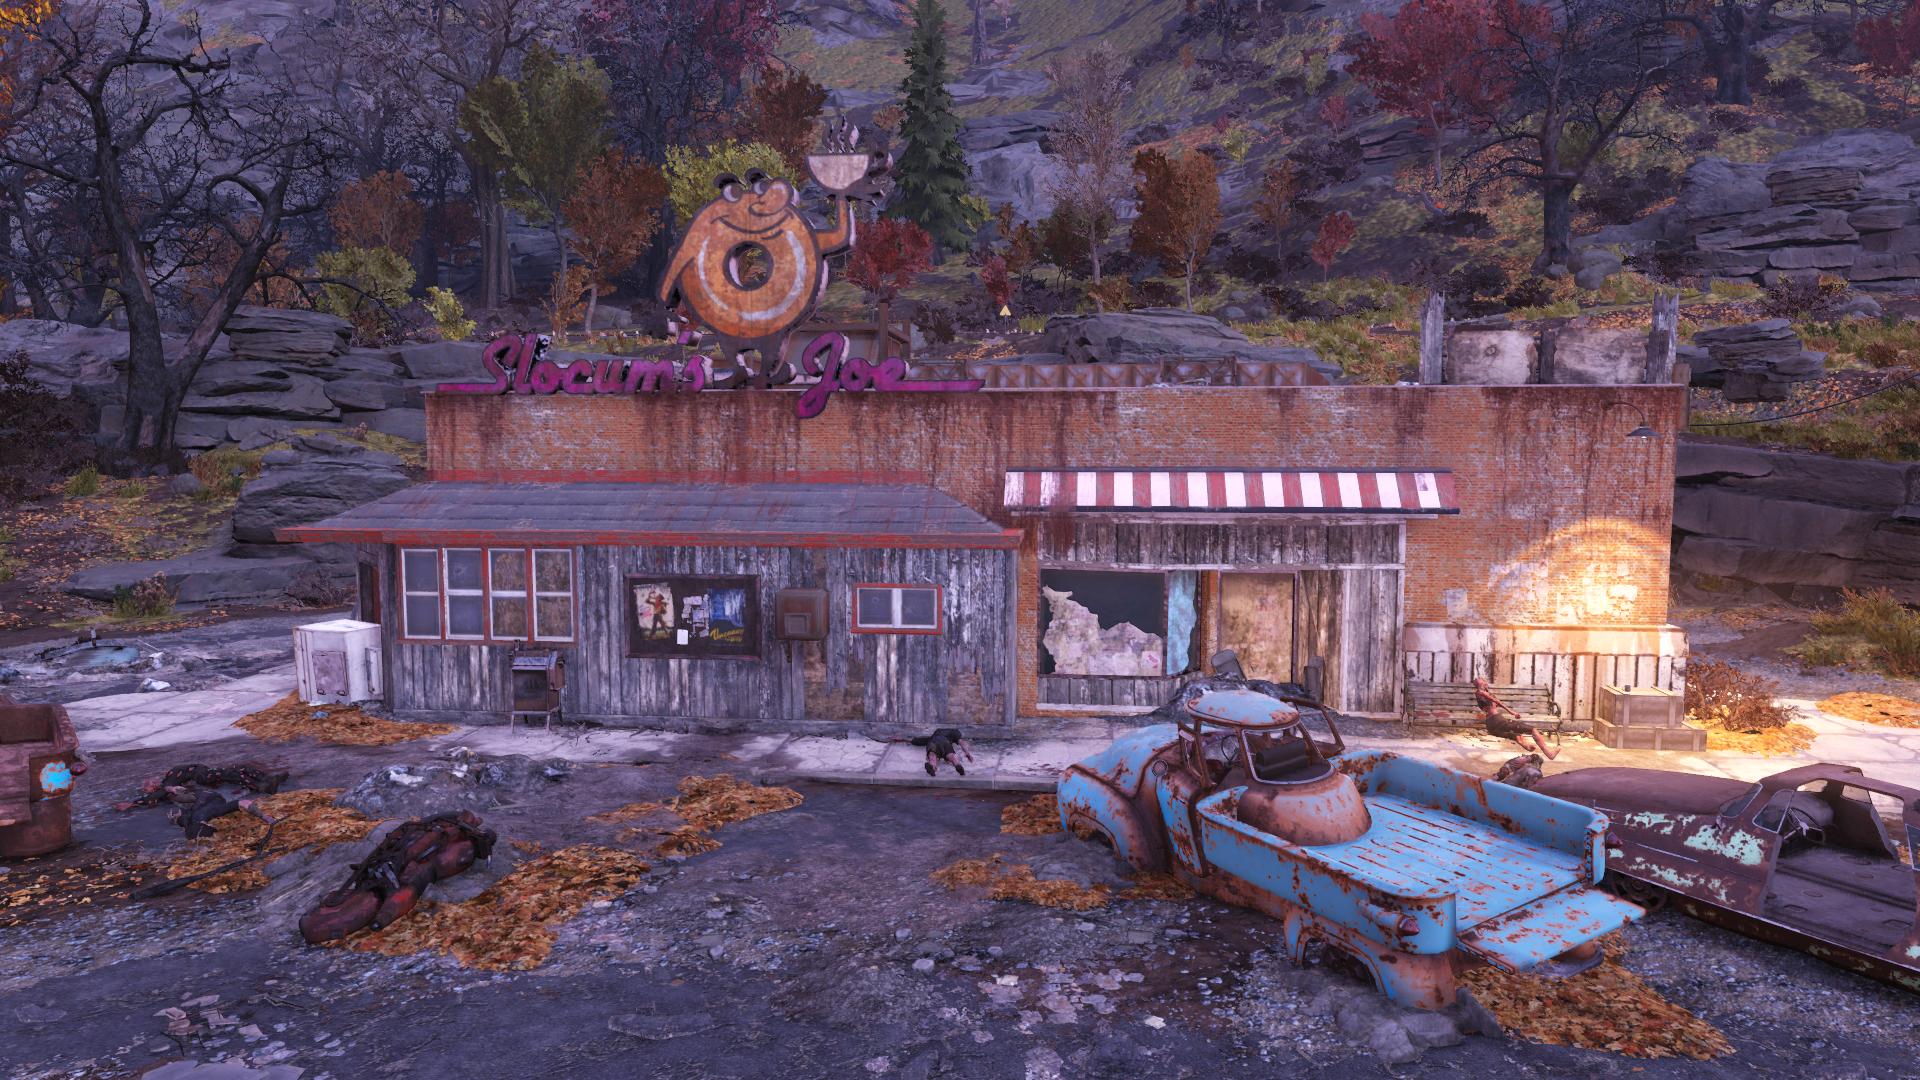 Slocum's Joe (Fallout 76)